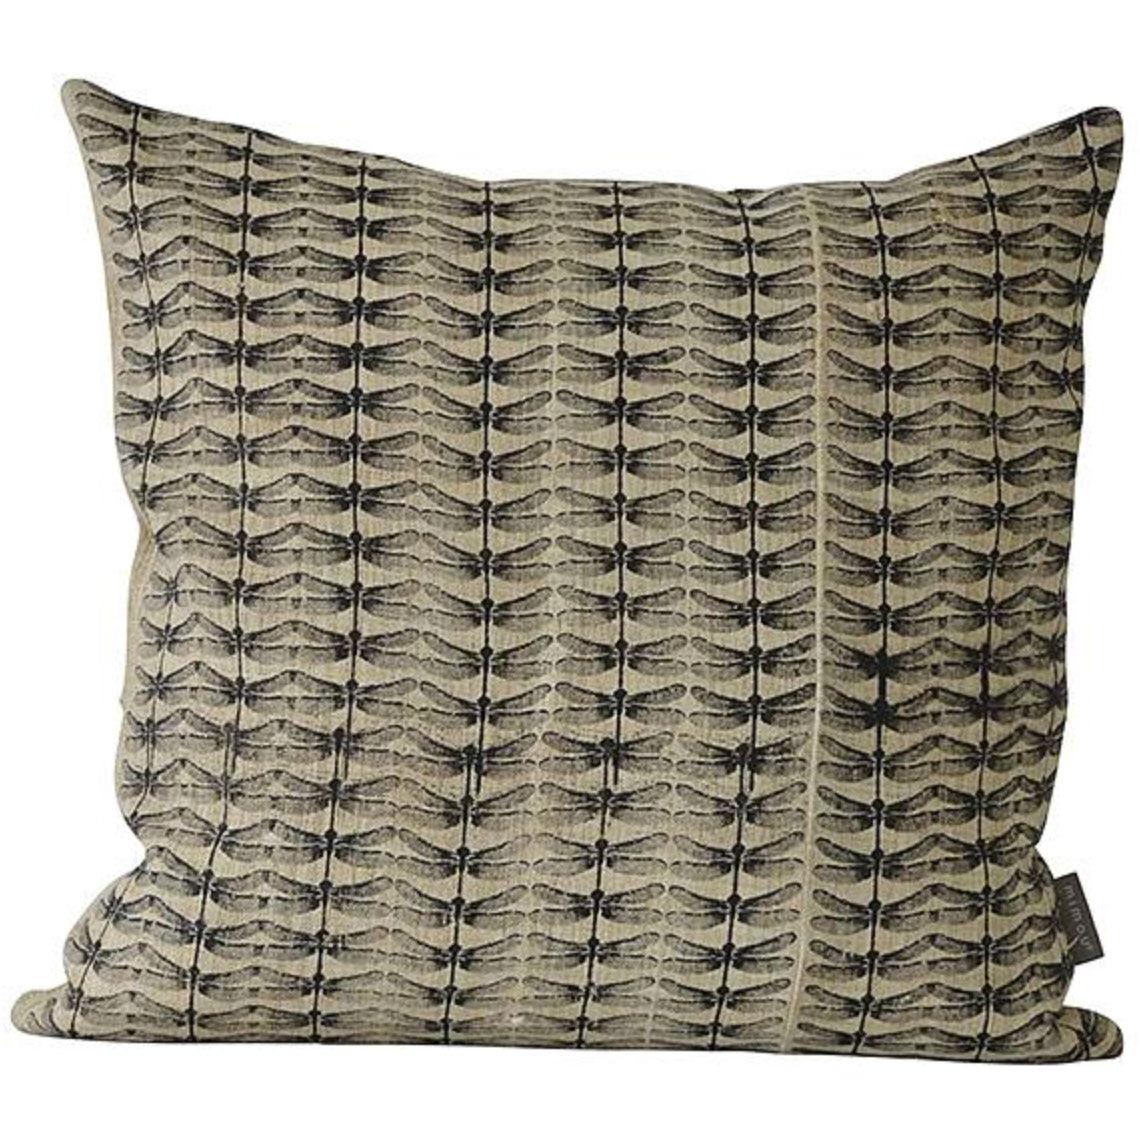 Mimou-Dragonfly Cushion 50x50 cm, Black